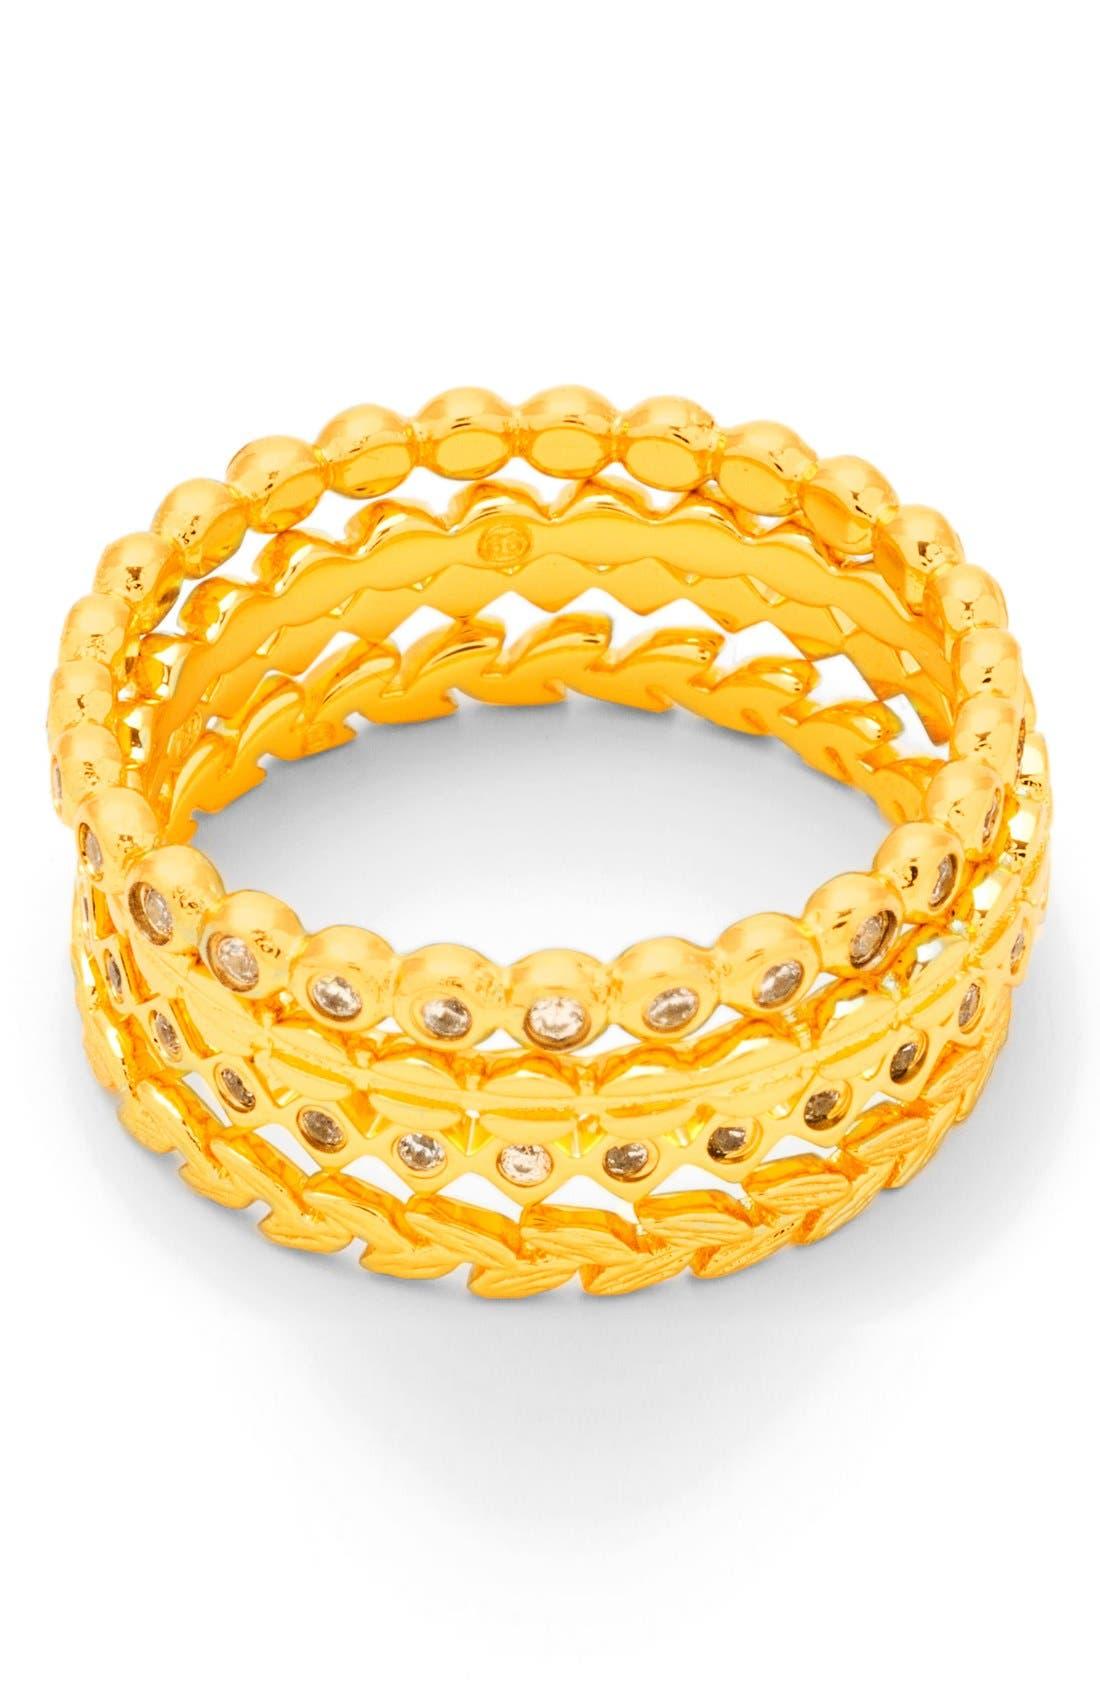 Stackable Set of 4 Band Rings,                             Main thumbnail 1, color,                             GOLD